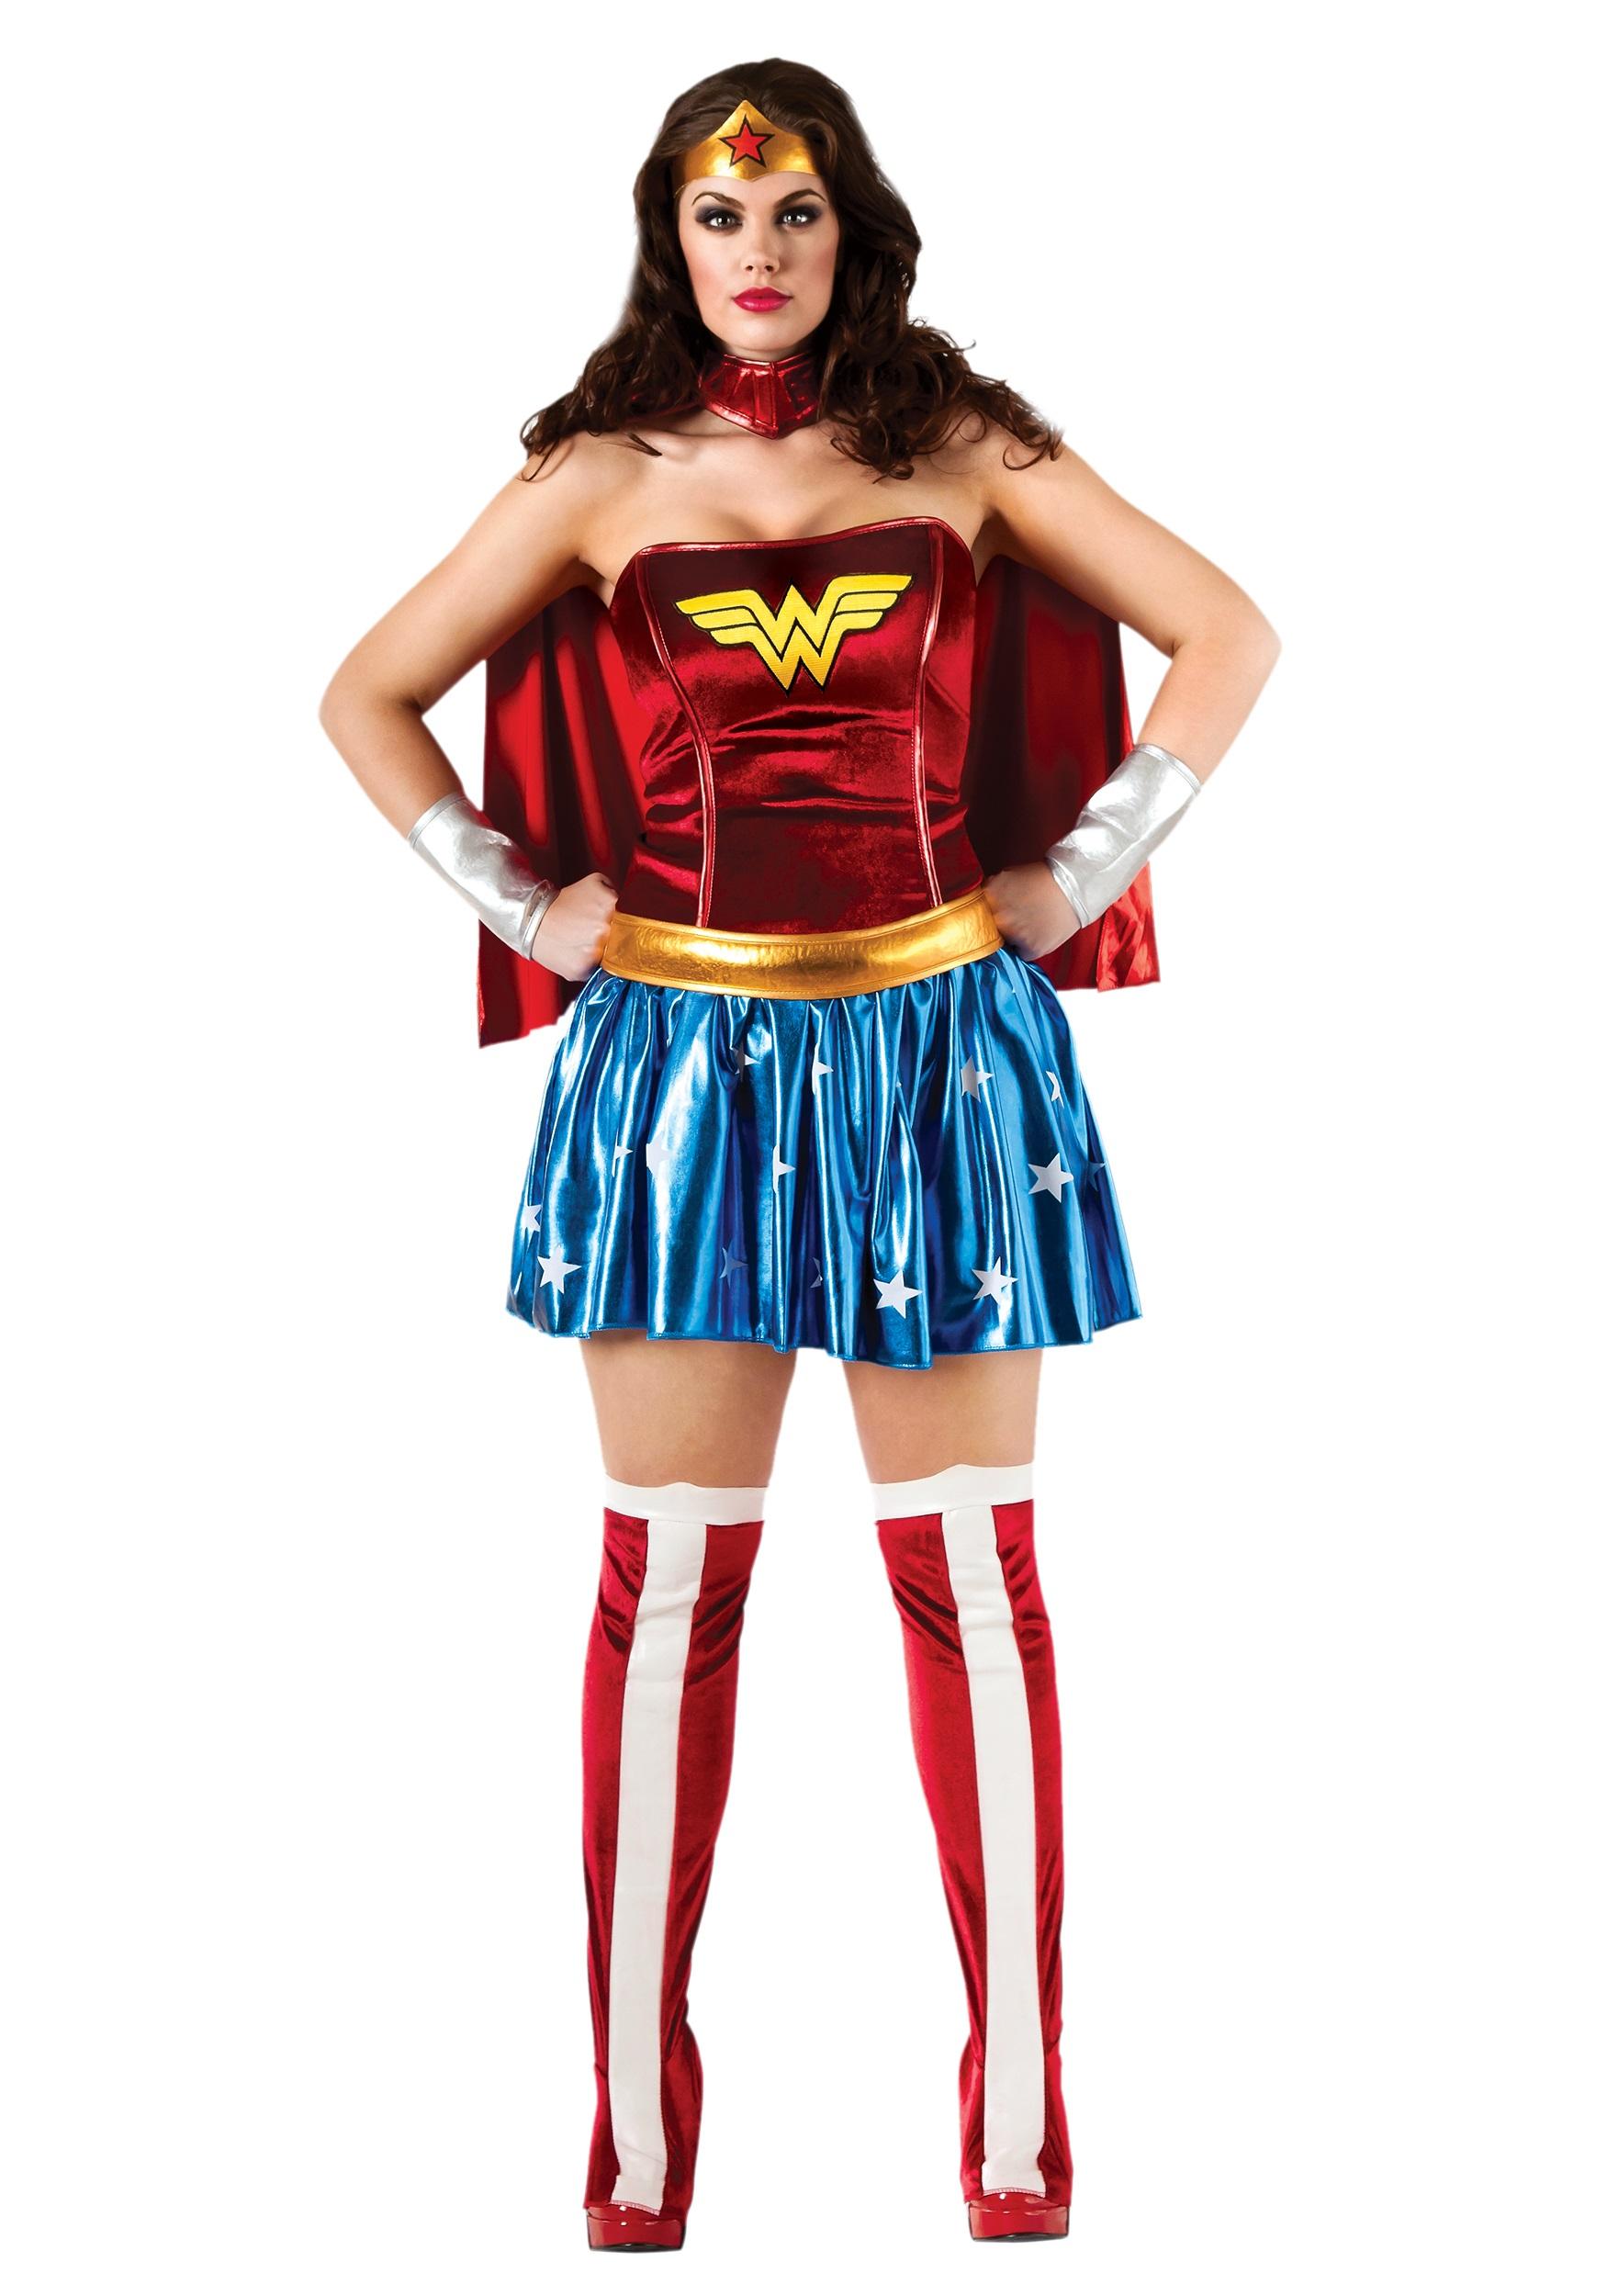 Wonder Woman Plus Size Superhero Costume  sc 1 st  Fun.com & Plus Size Wonder Woman Superhero Costume